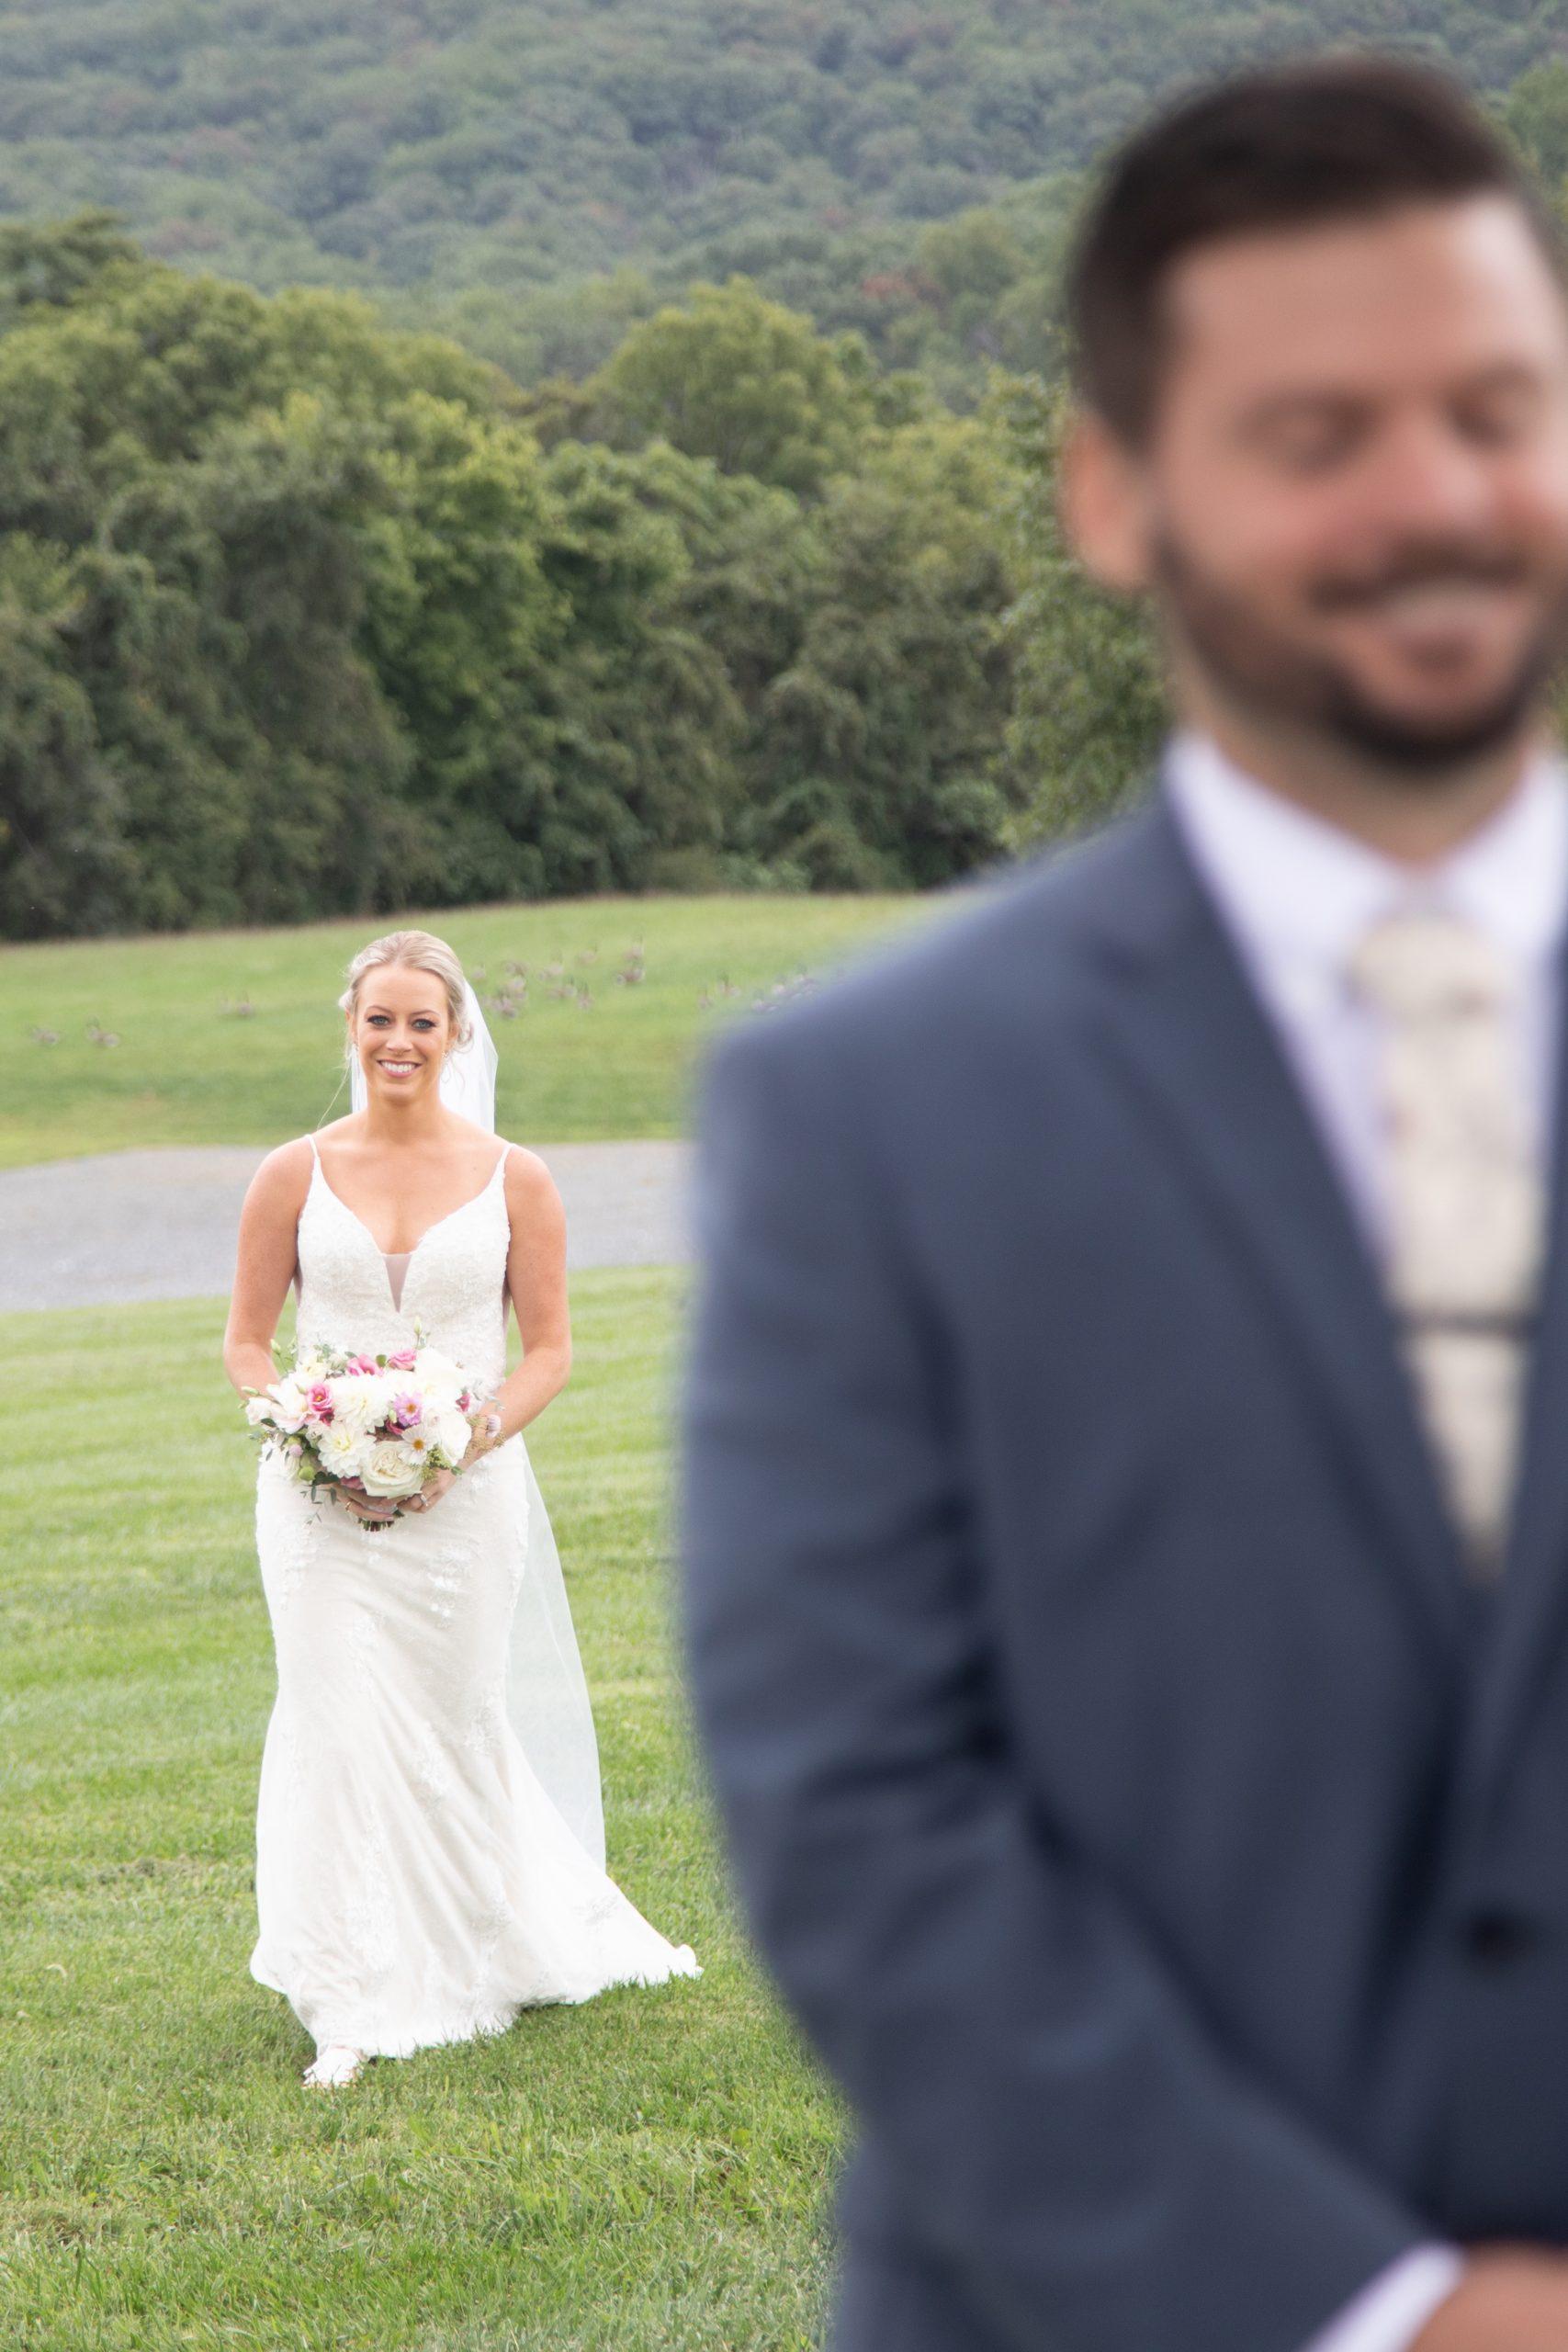 Kalero Vineyard wedding first look photographs, Stephanie Leigh Photography & Design